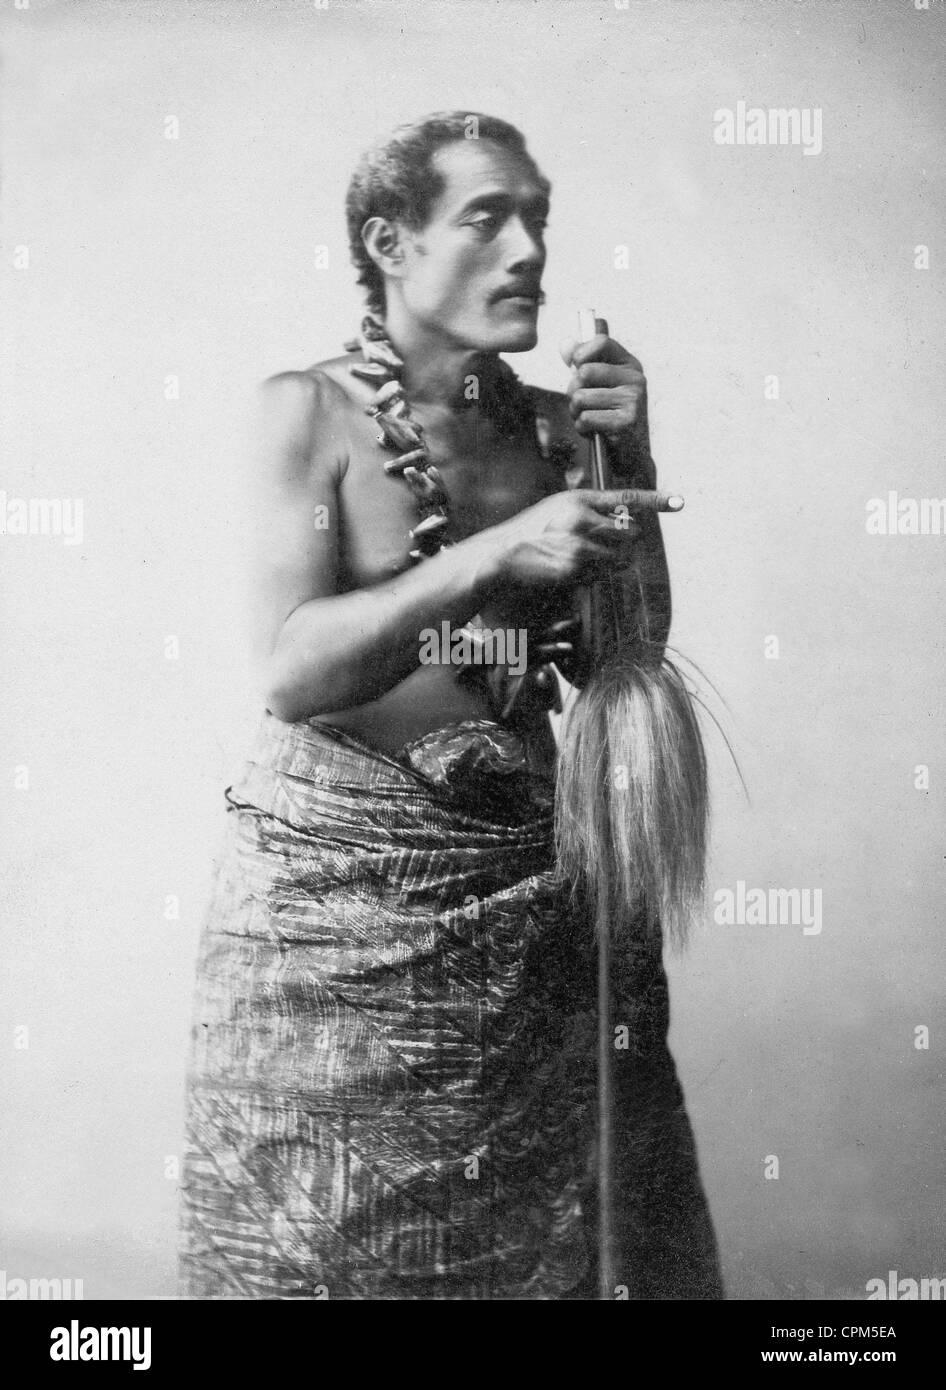 Lanati, Samoan chieftain, 1903 - Stock Image